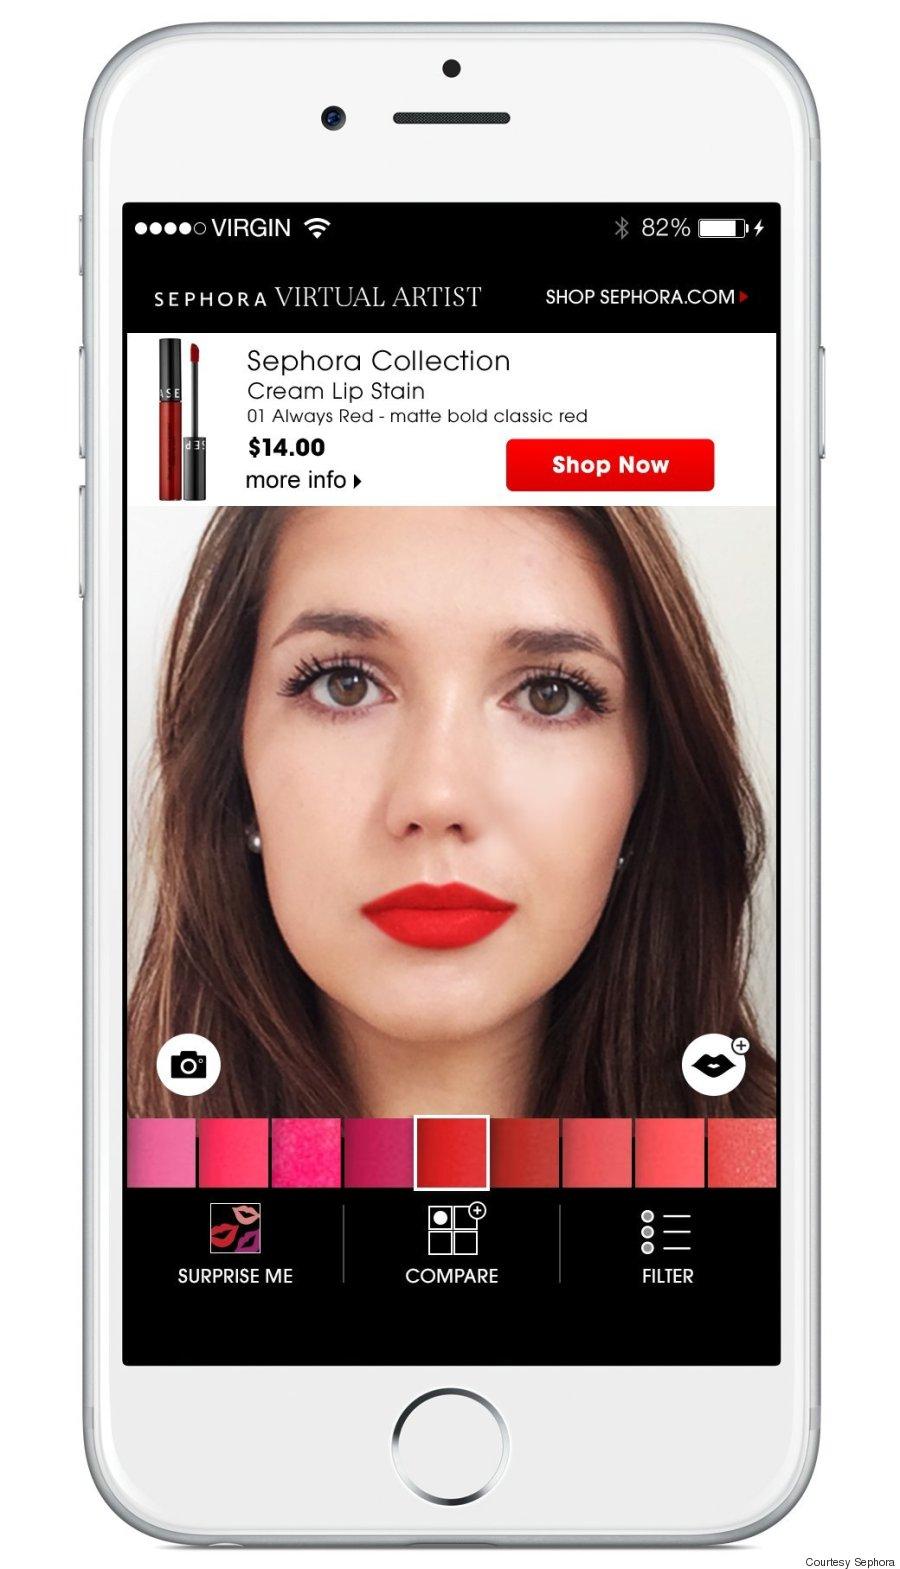 Sephora free makeup application - Verizon wireless iphone ...